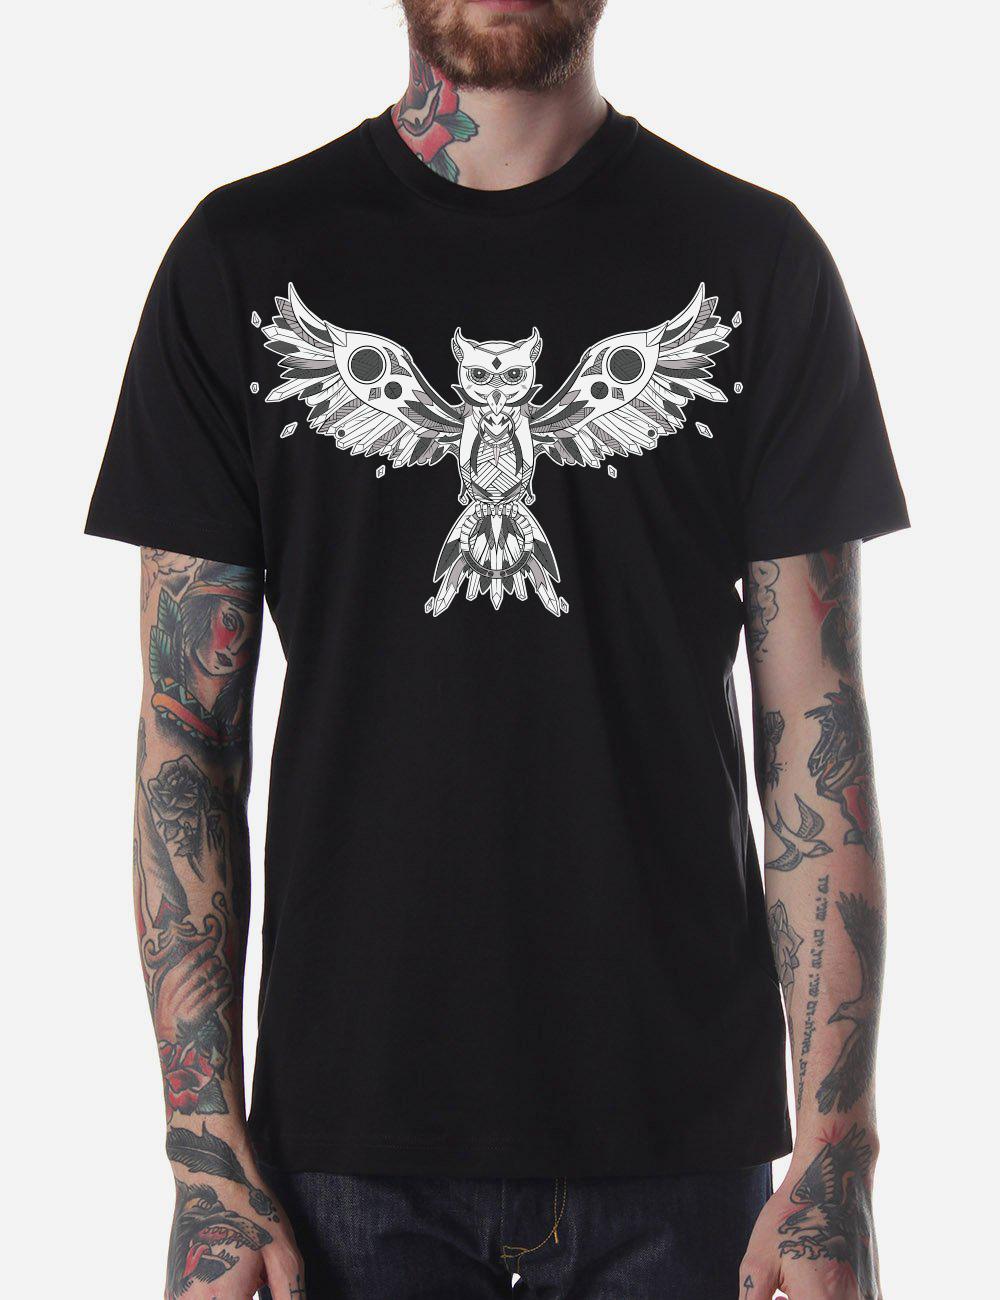 T恤印花图案设计定制 -e1273b26033781.5634e90c7632b